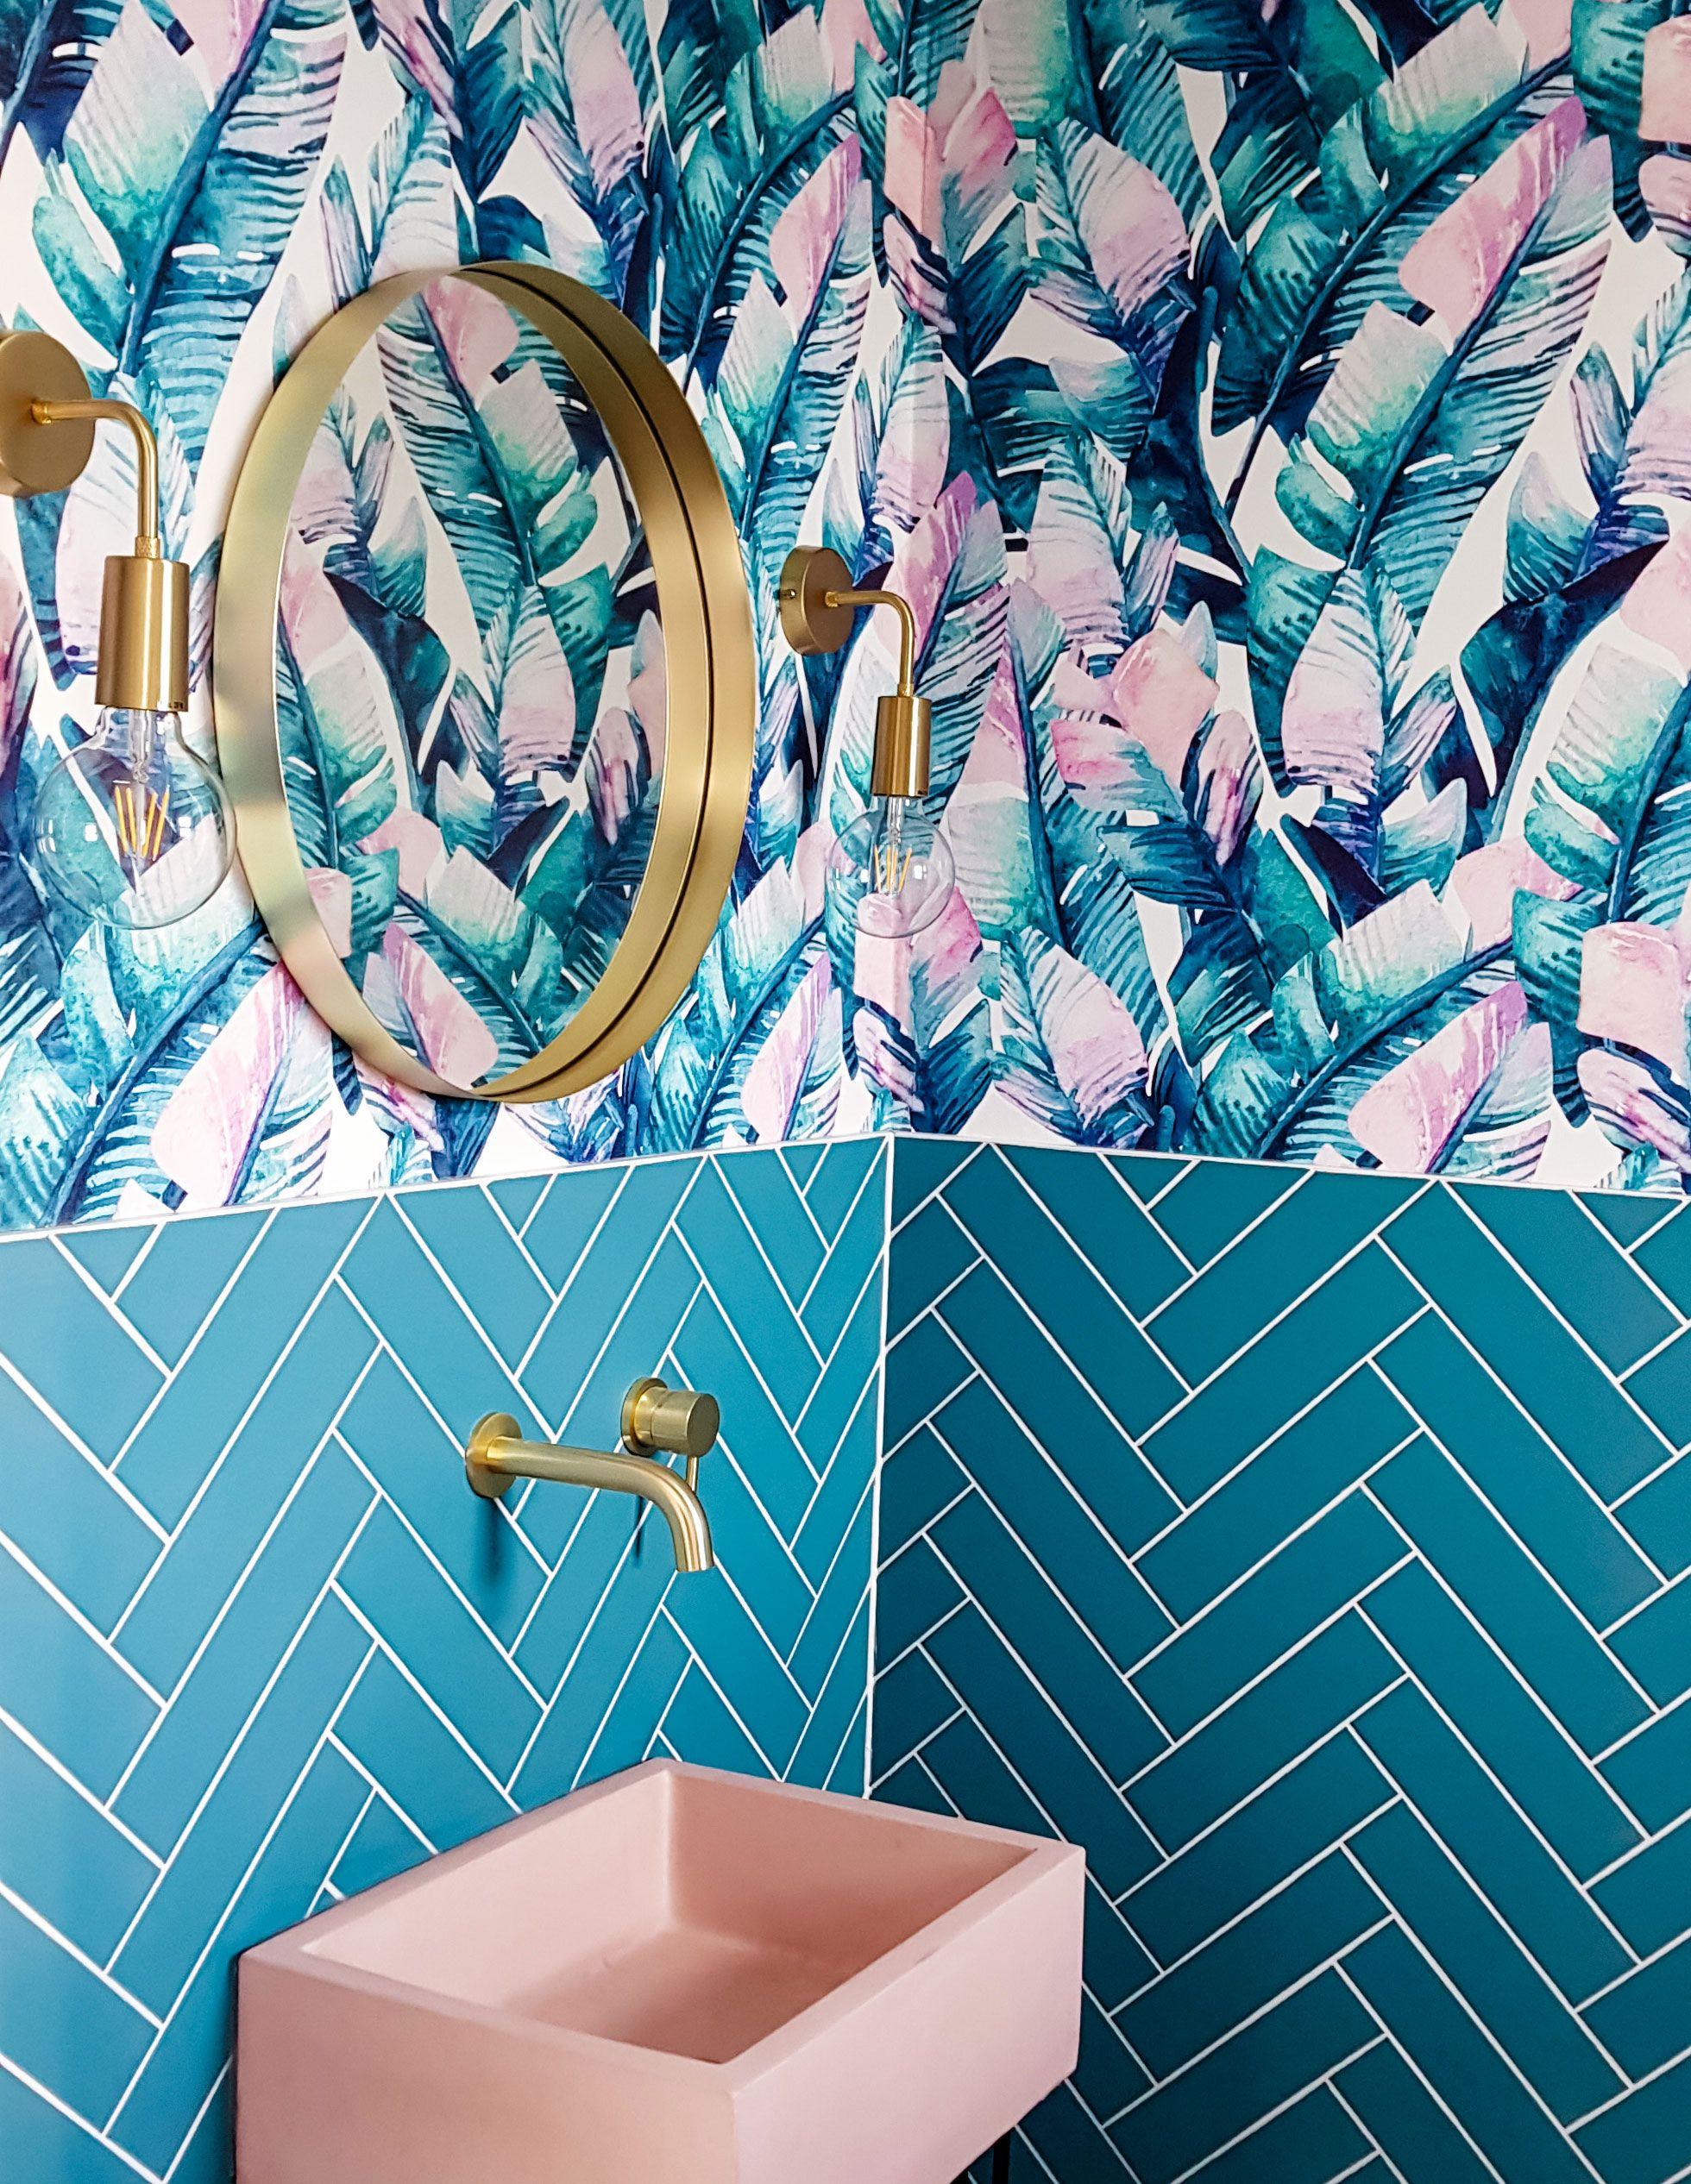 Banana Leaf in 2020 Tropical wallpaper, Tropical